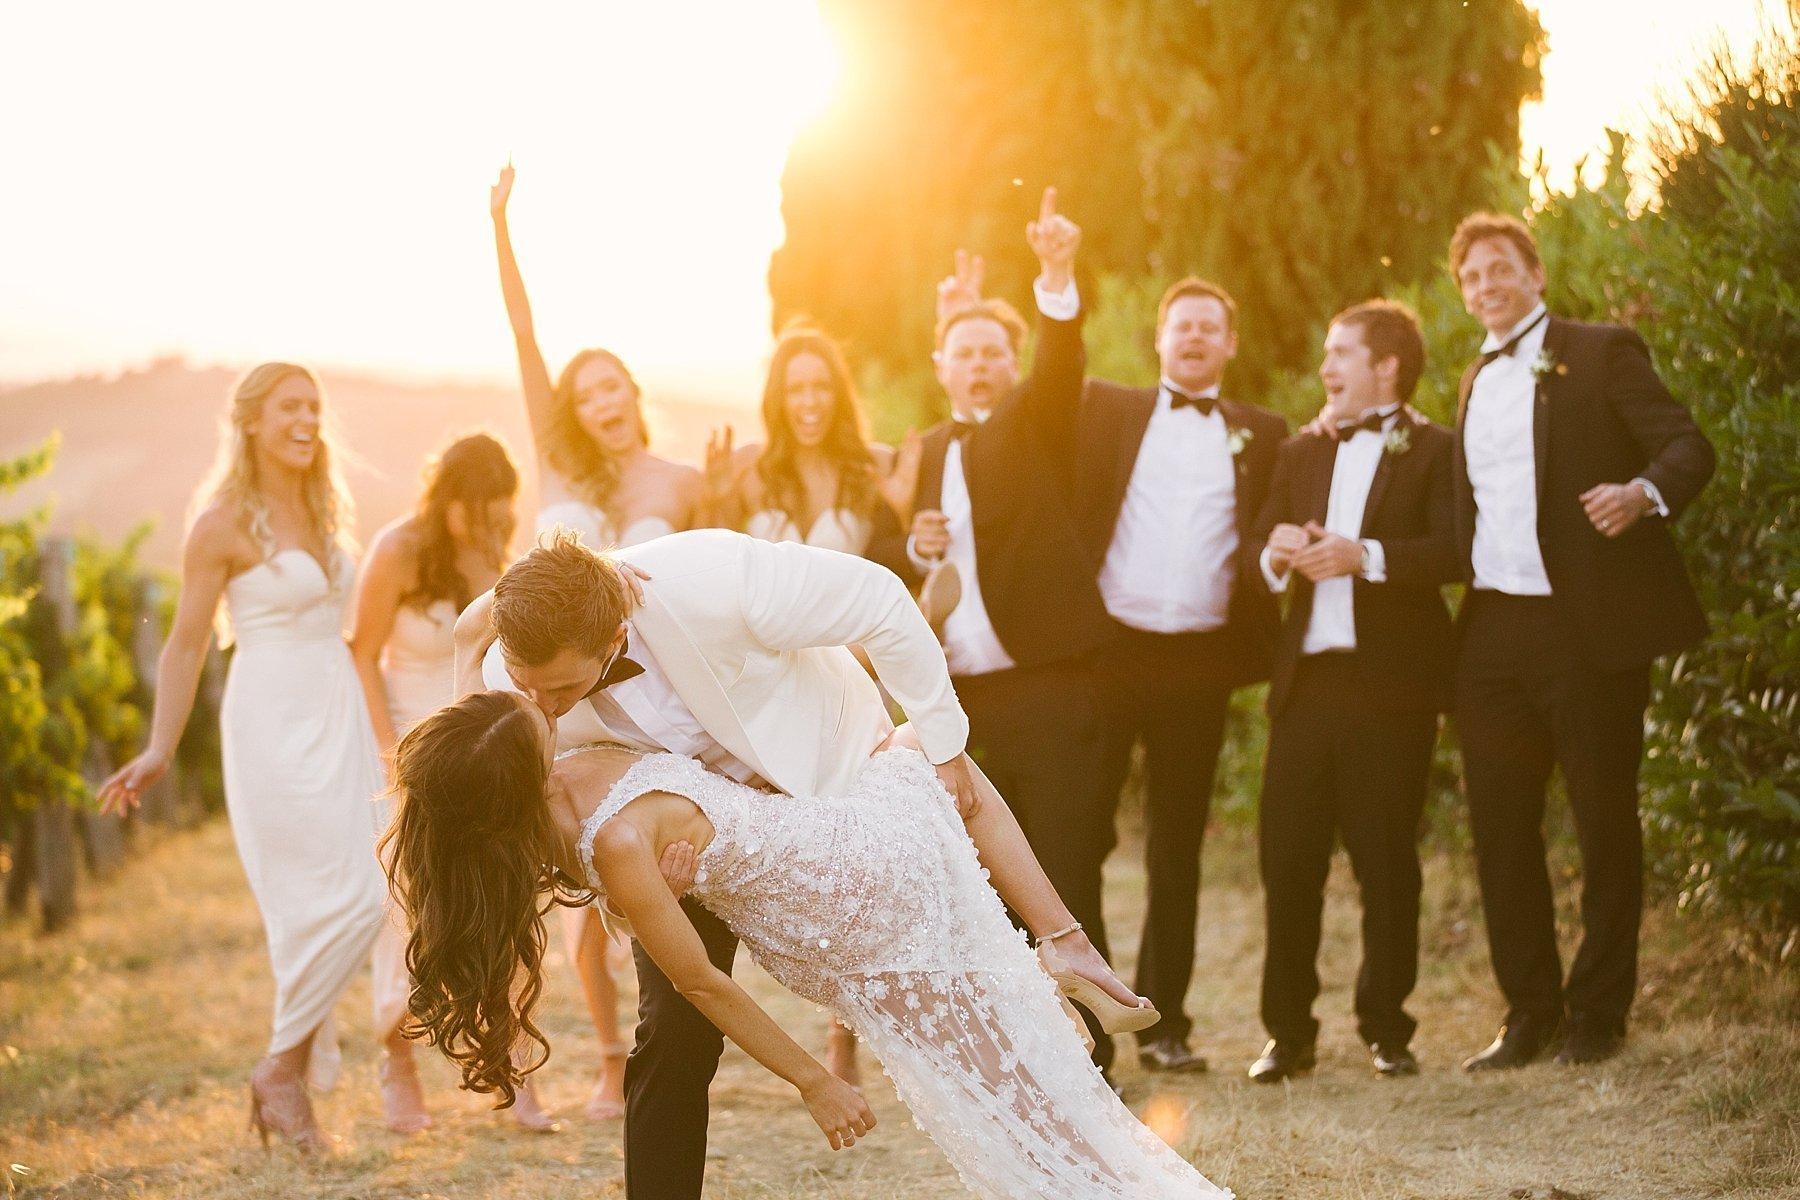 Dj Matrimonio Toscana : Tasten sax sax dj music show per matrimoni parties ed eventi